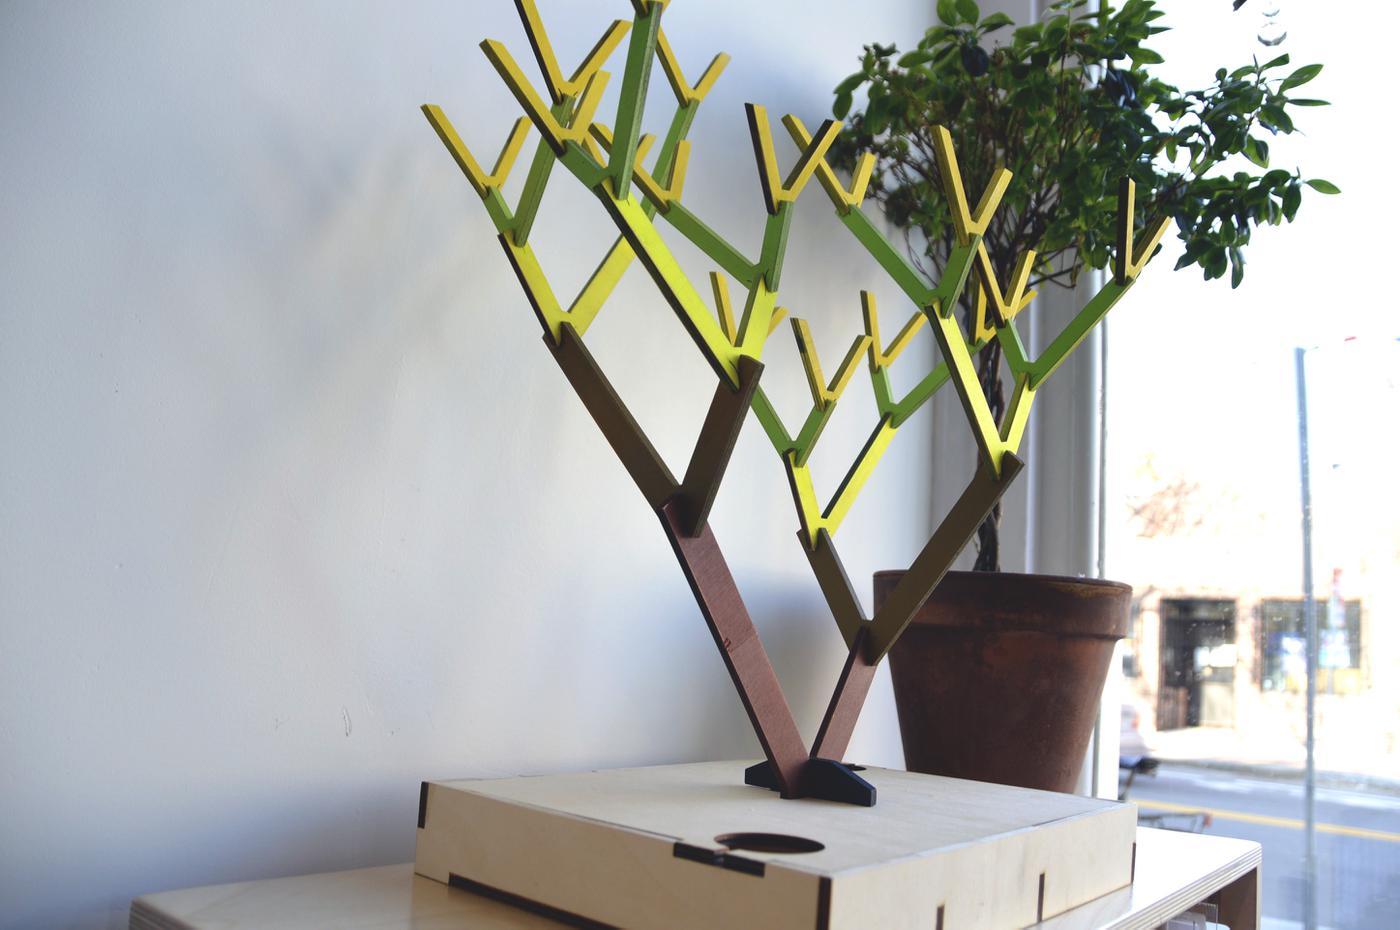 Initial Design & Engineering Prototype